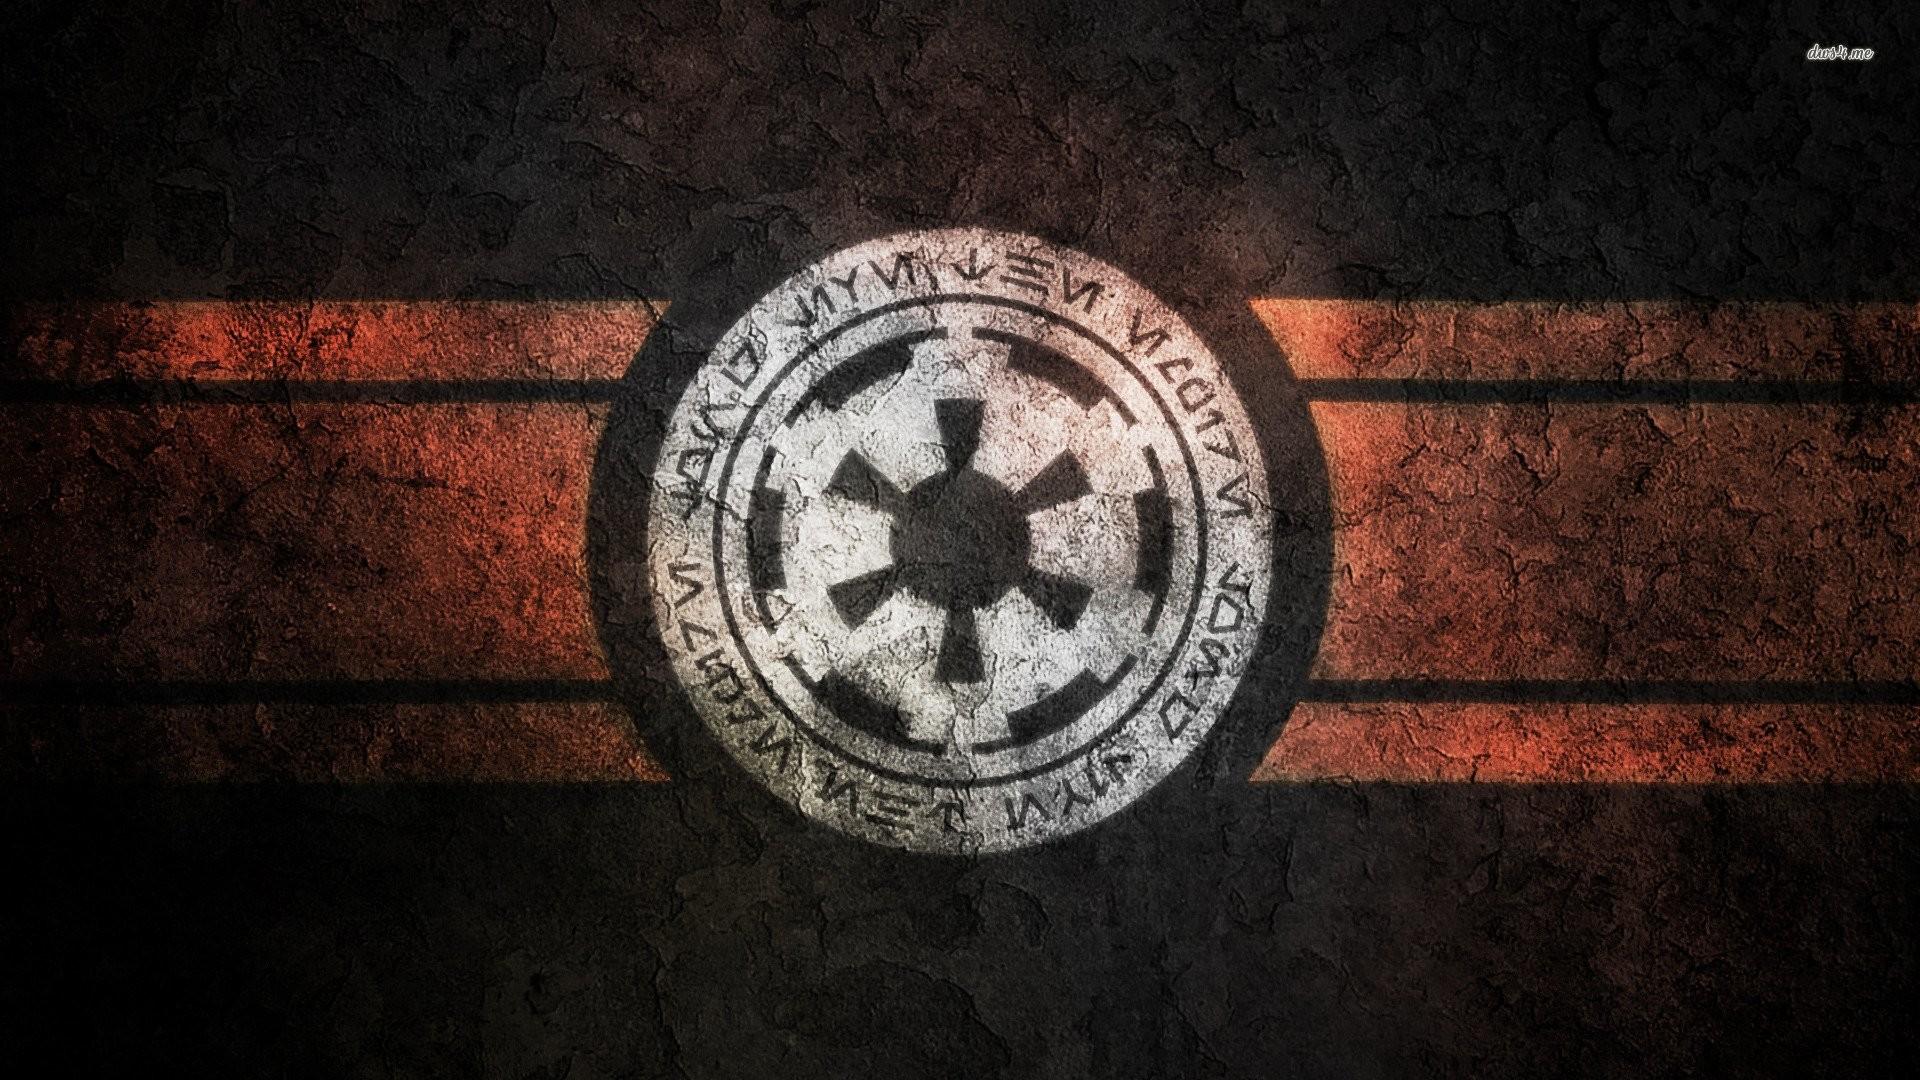 Galactic Empire – Star Wars 711555 …